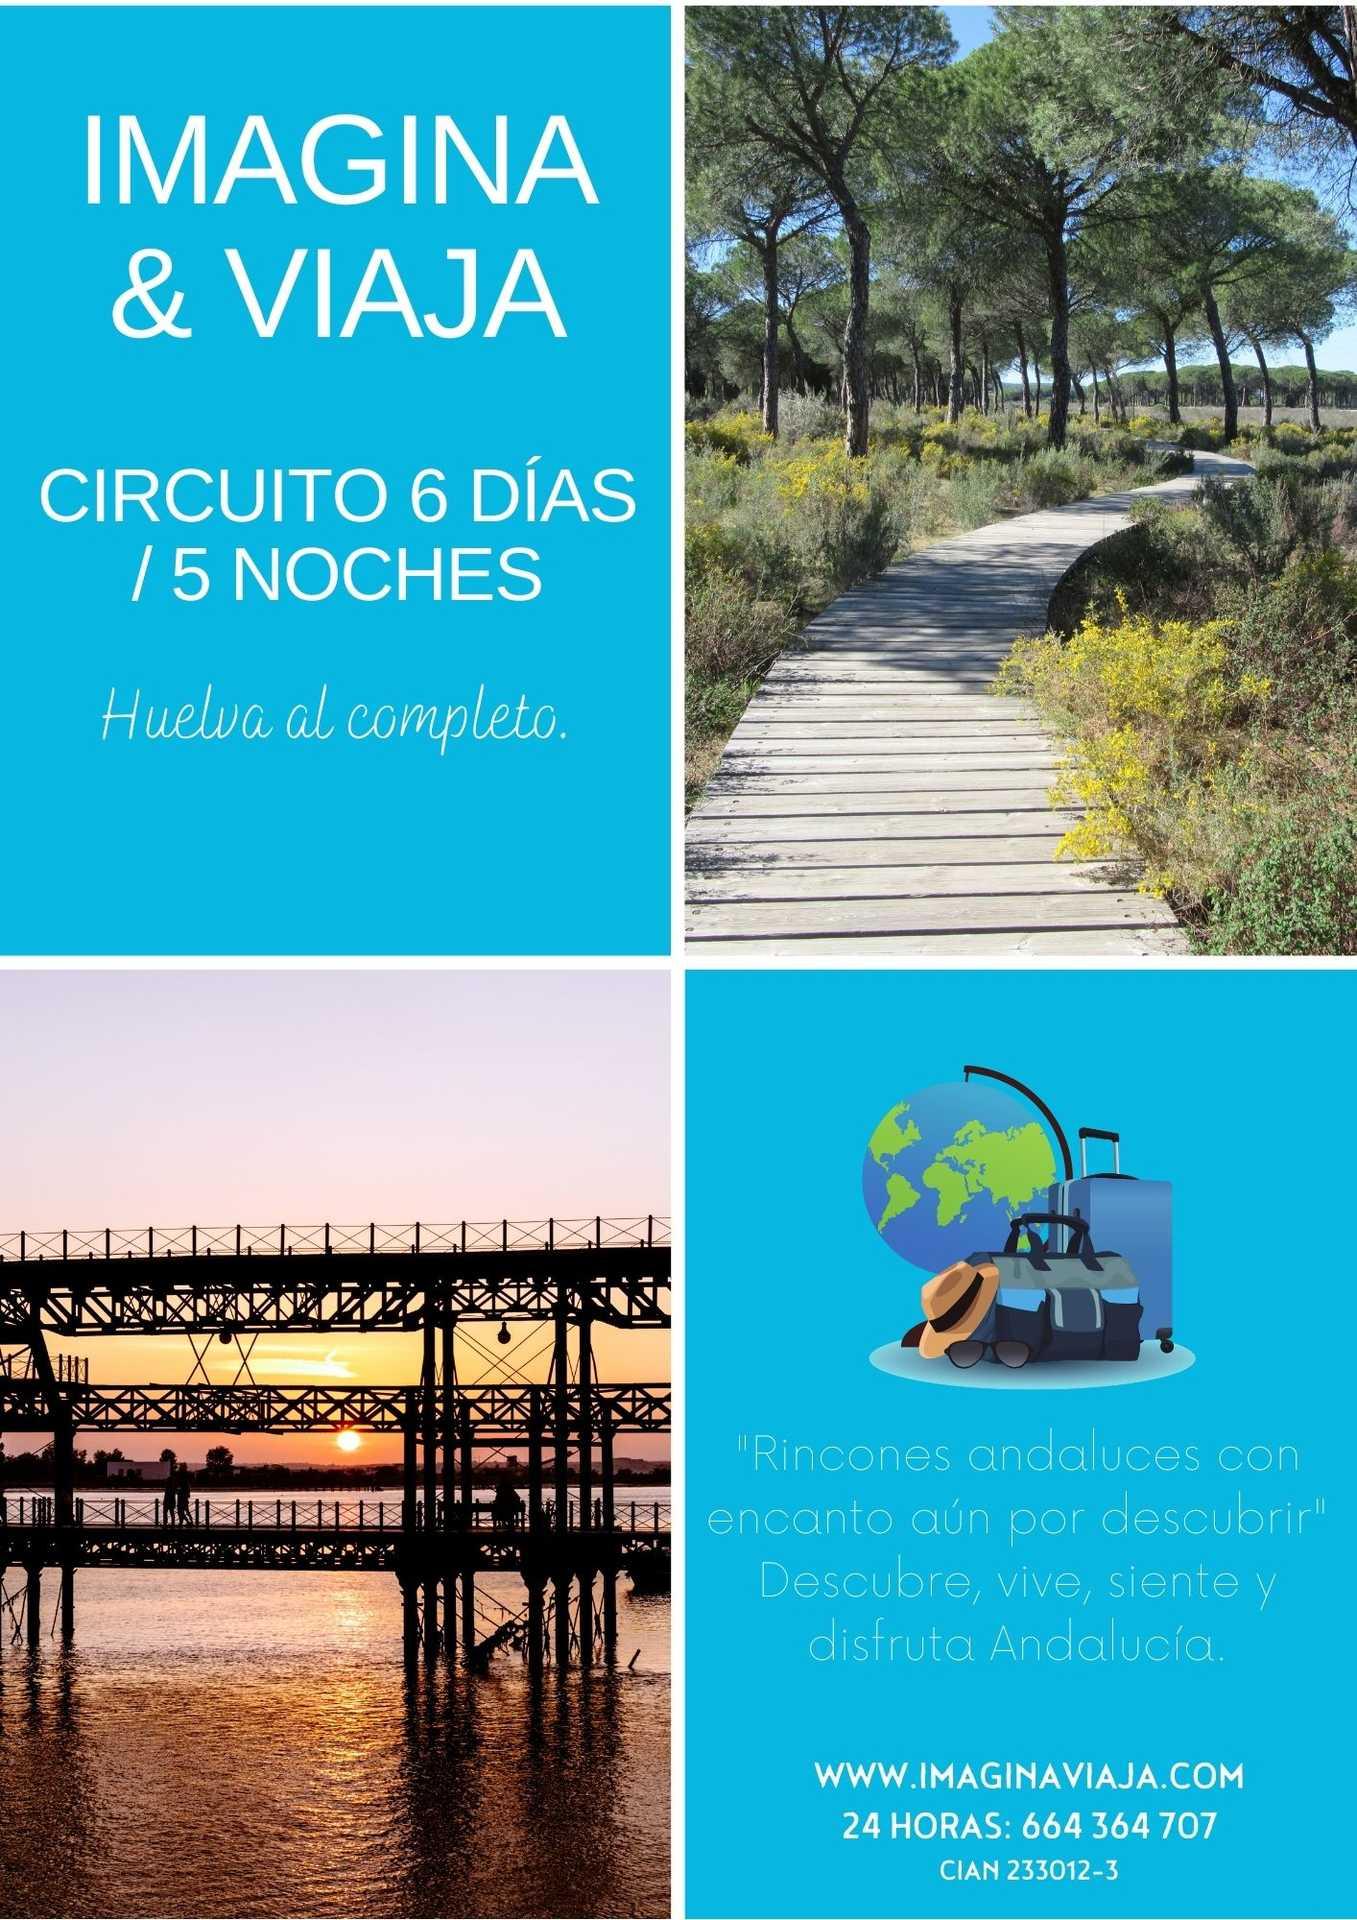 Huelva al completo